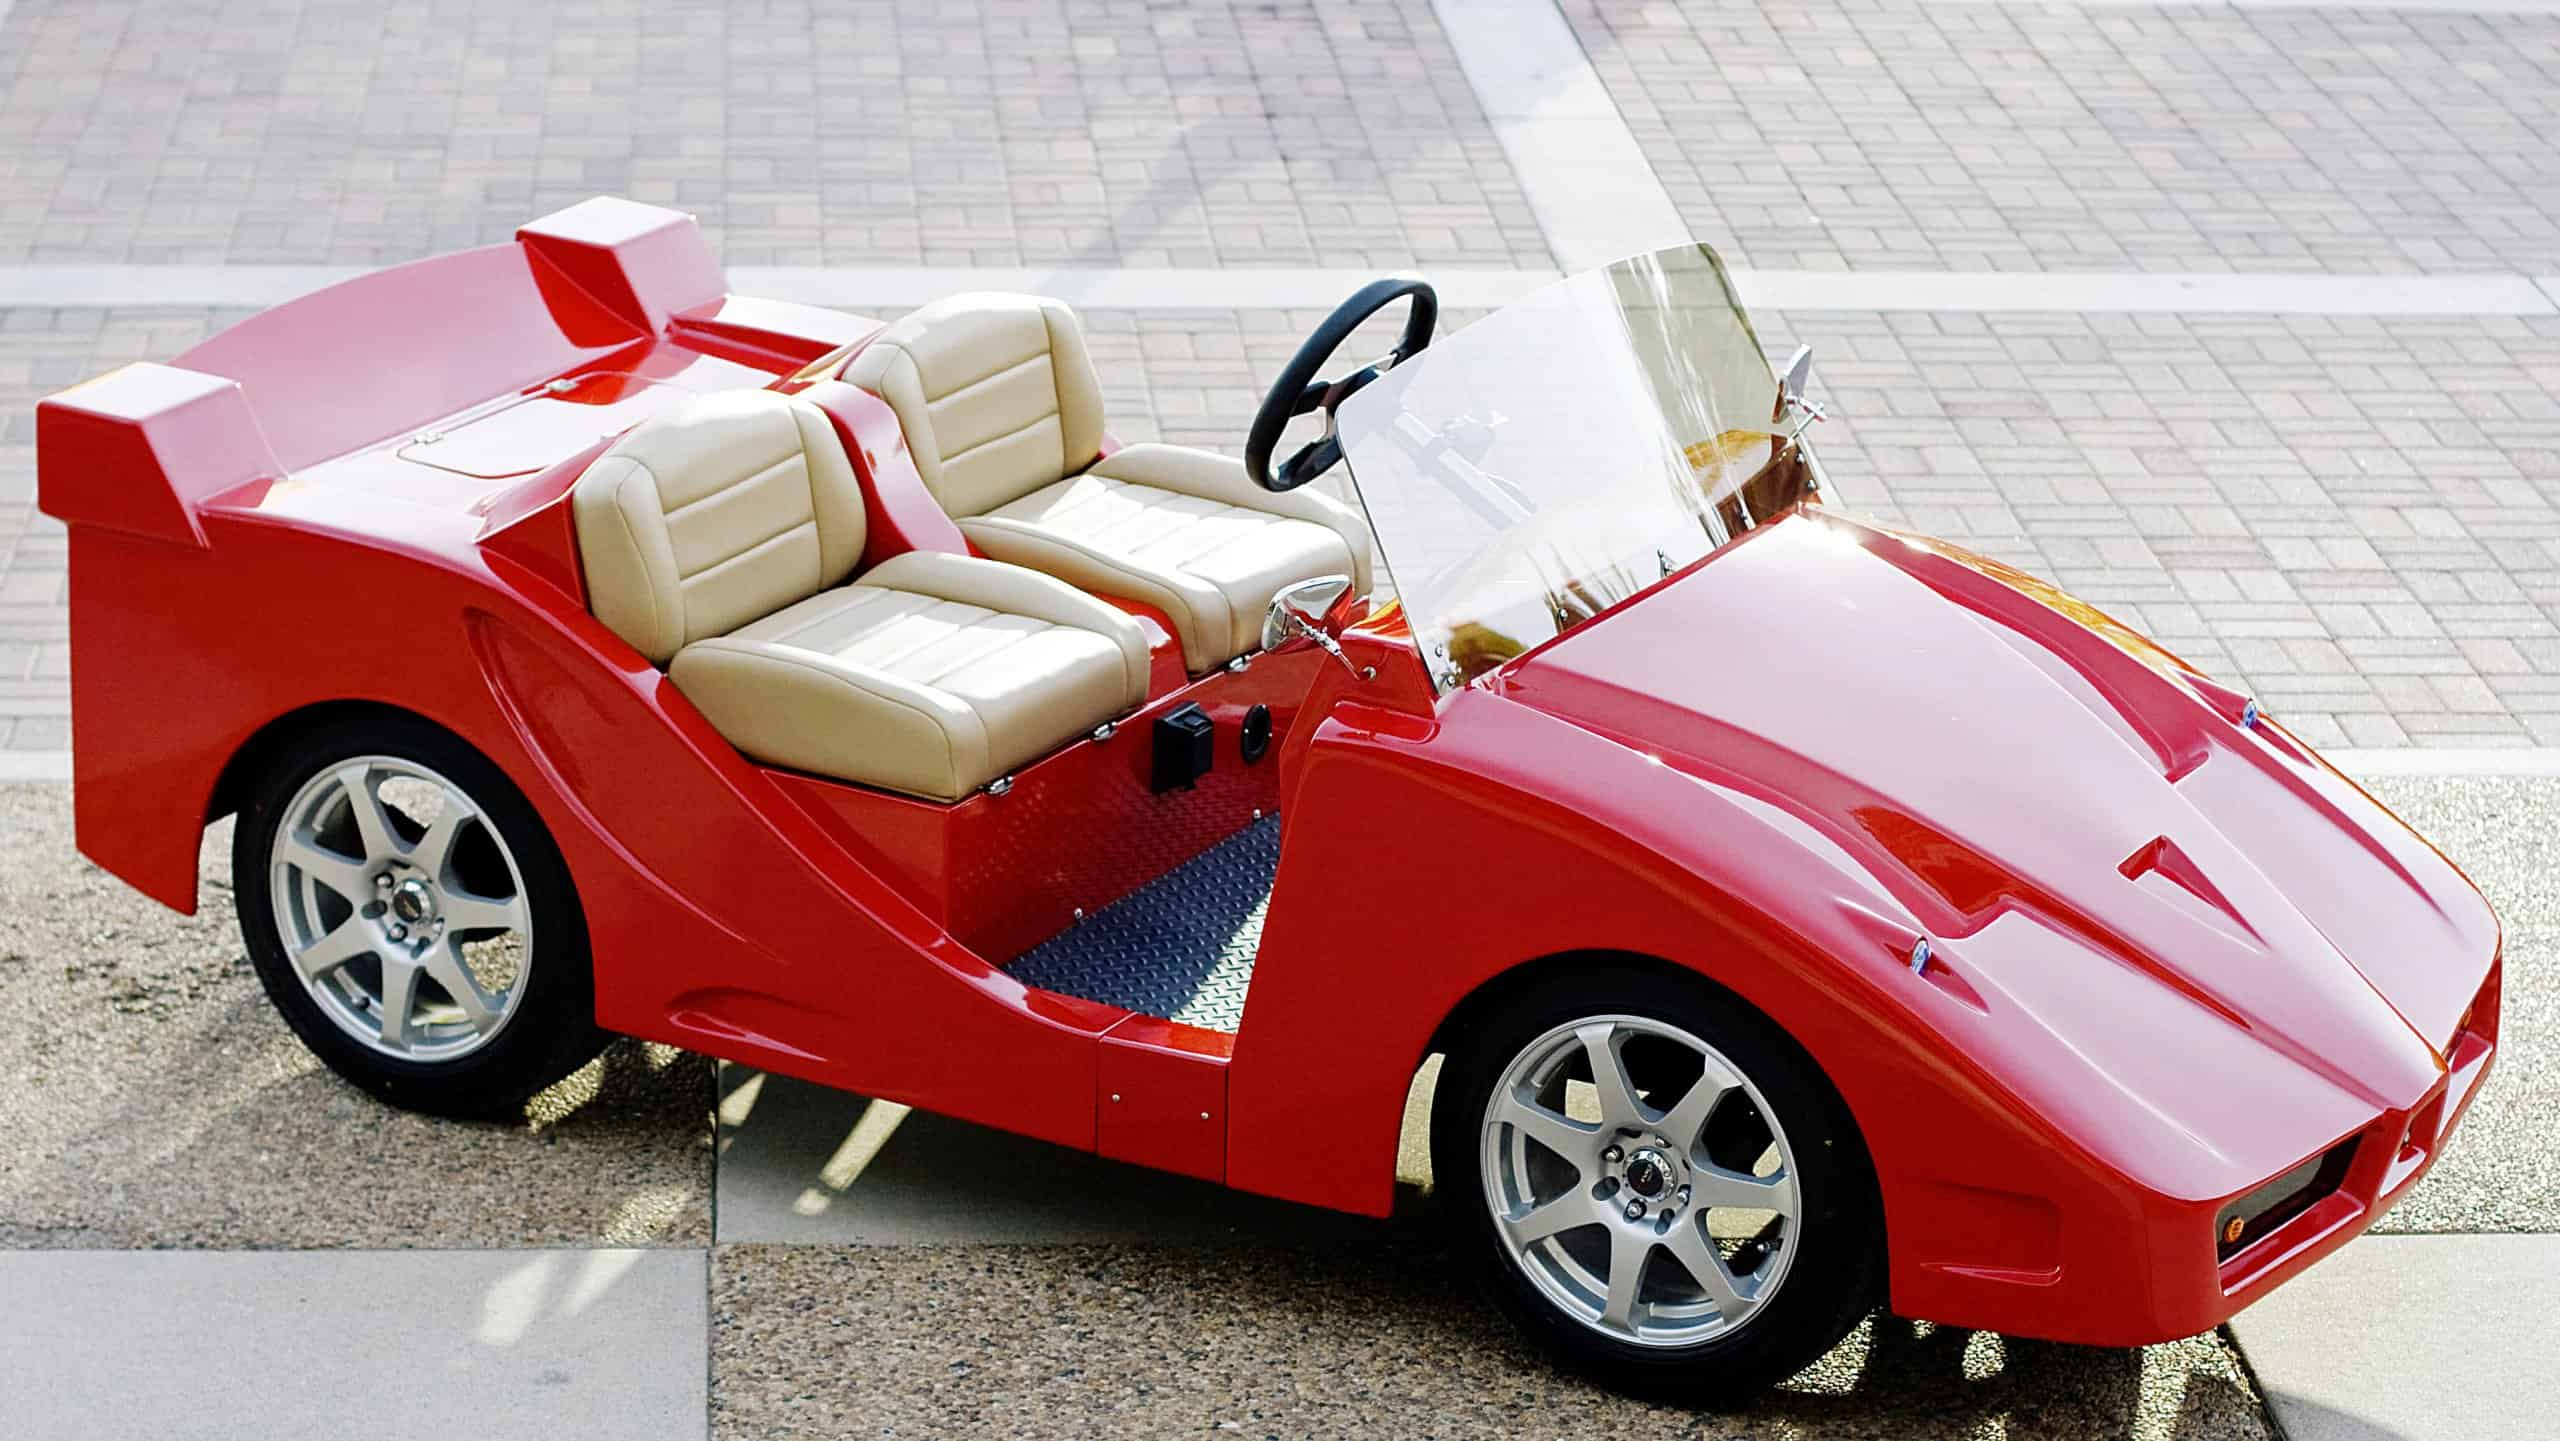 Ferrari F% golf cart